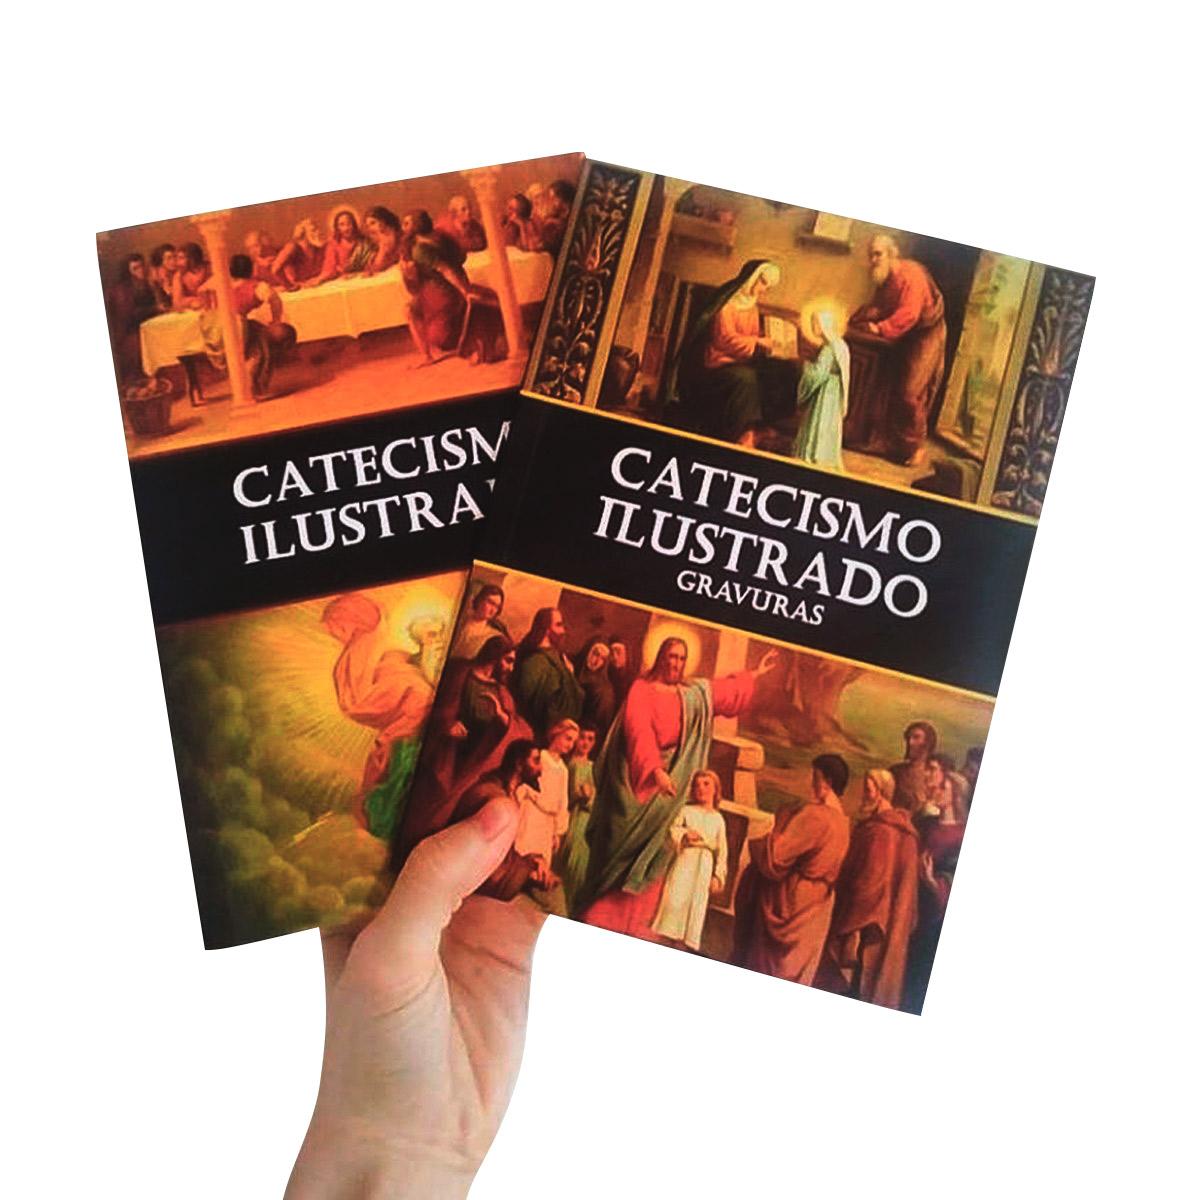 Catecismo ilustrado (2 vols.) Texto e gravuras